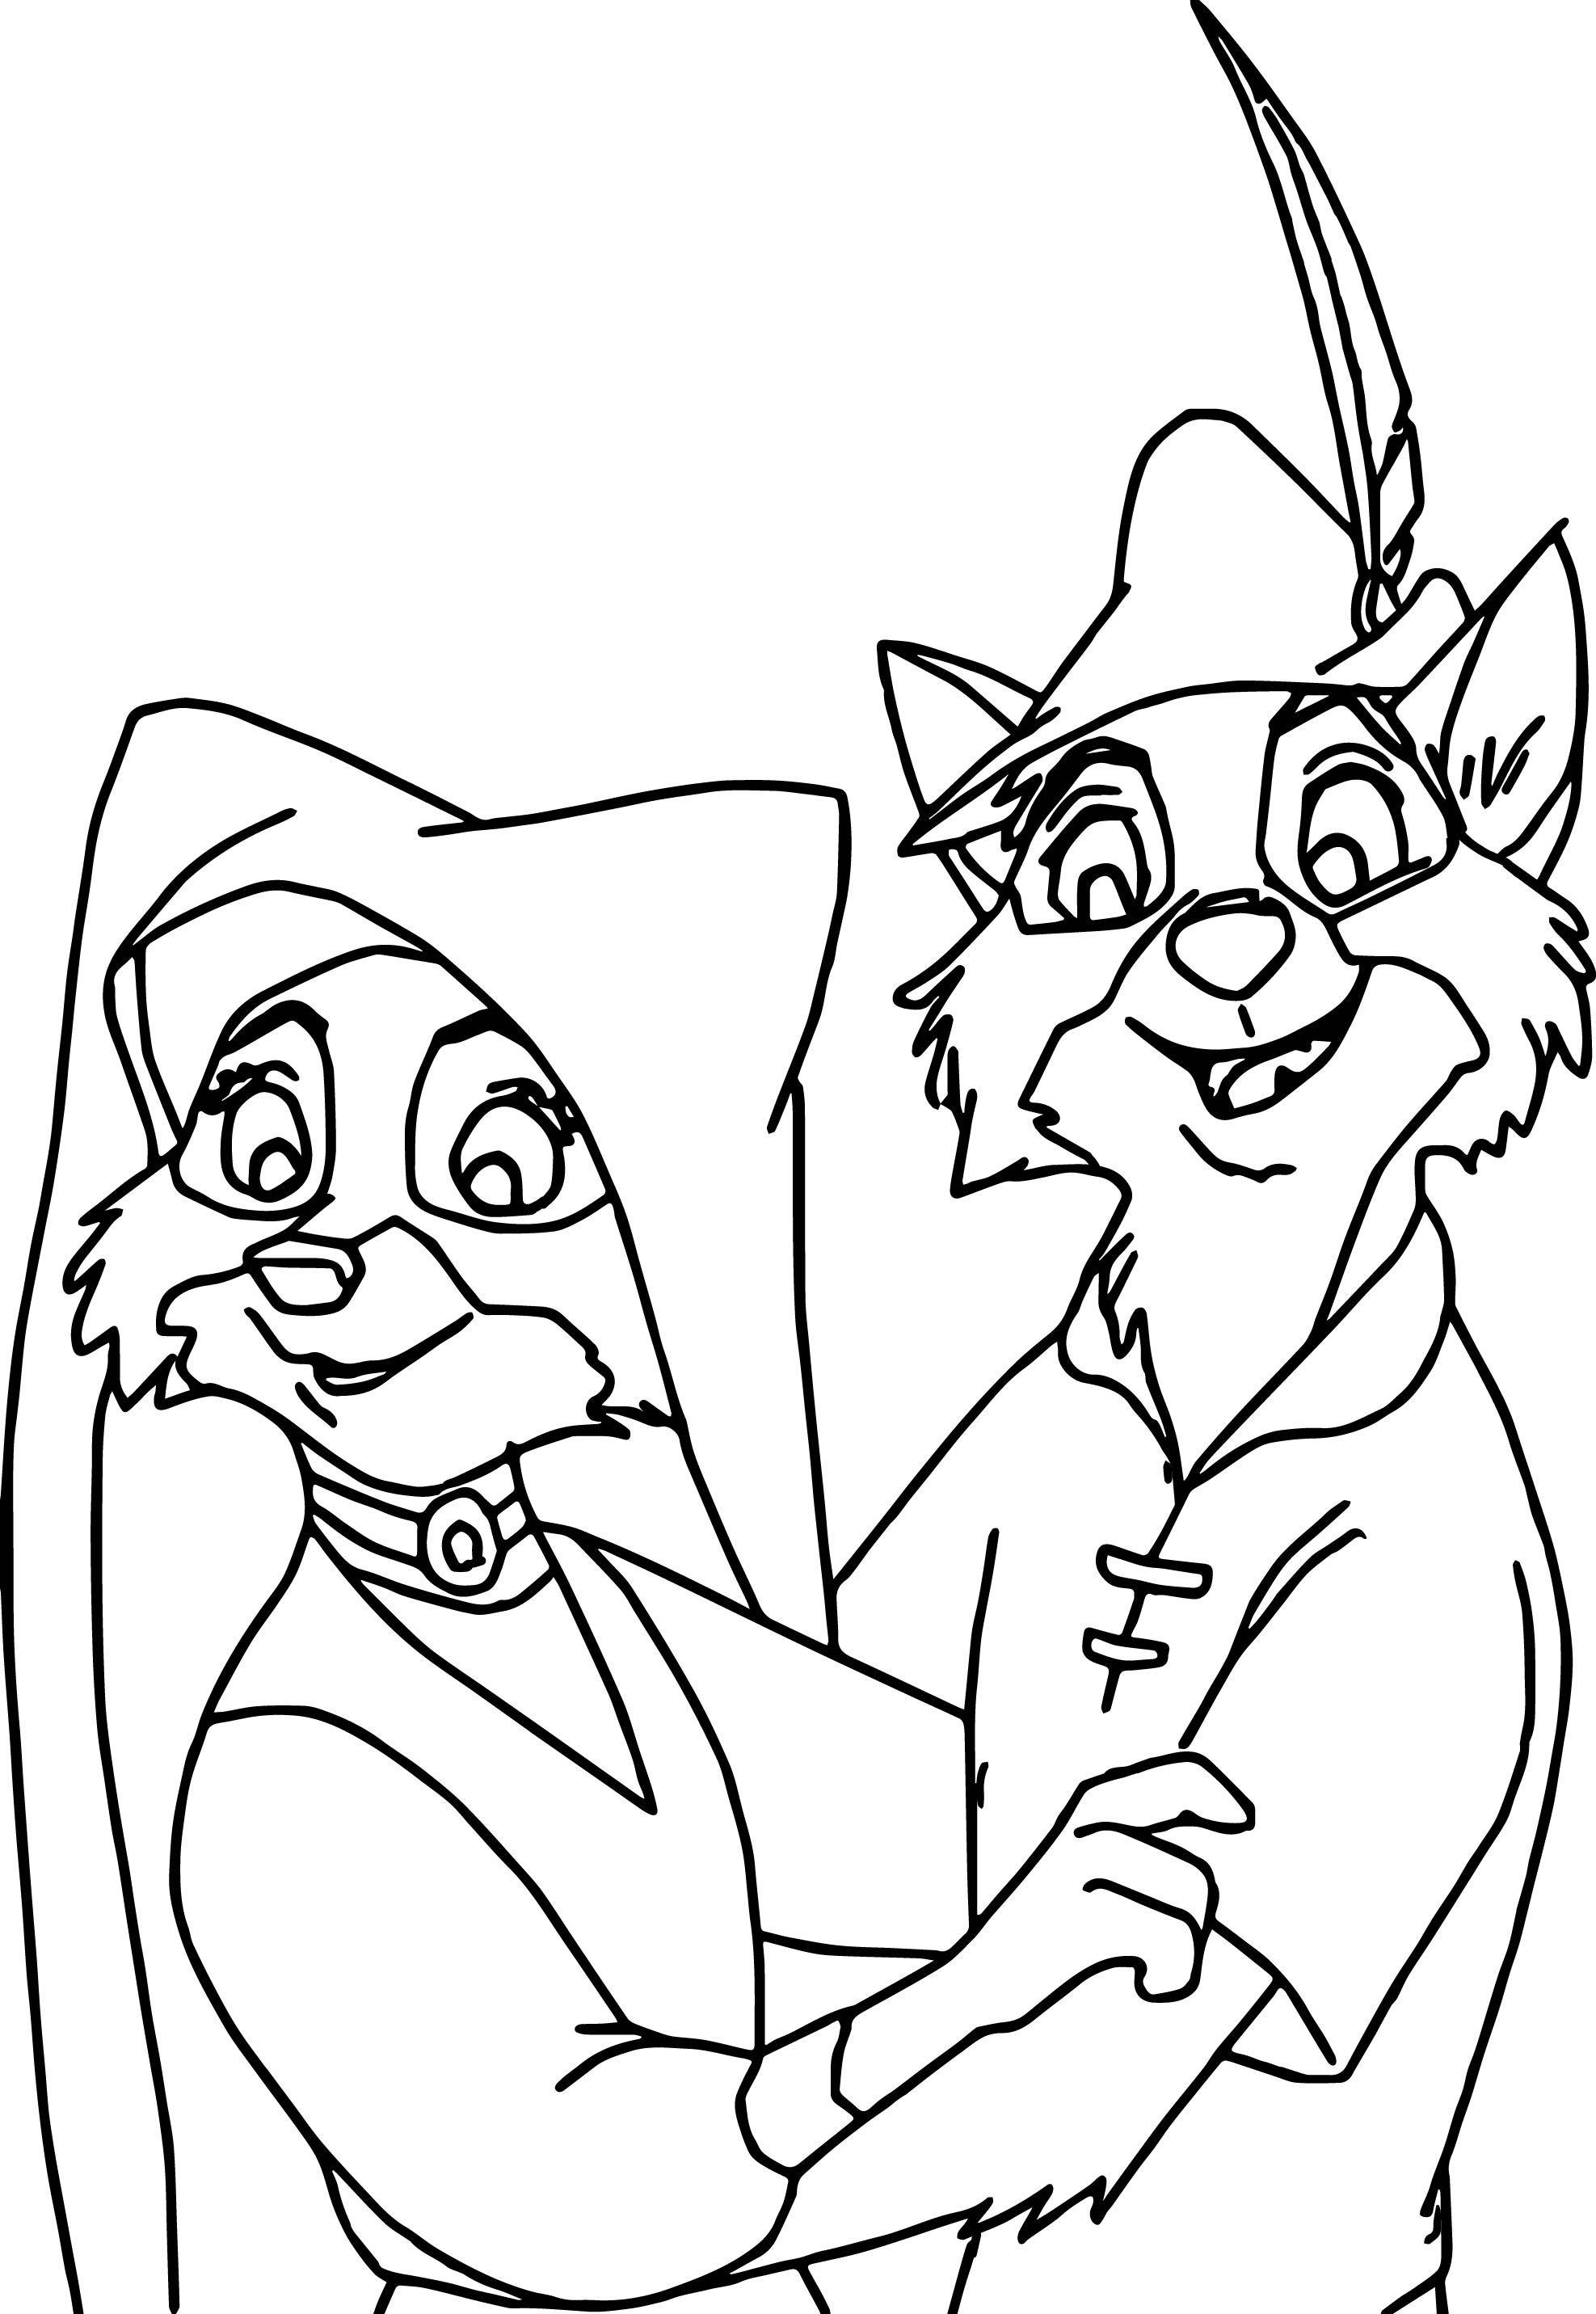 Robin Hood Disney Ausmalbilder : Disney Robin Hood Coloring Pages Wecoloringpage Pinterest